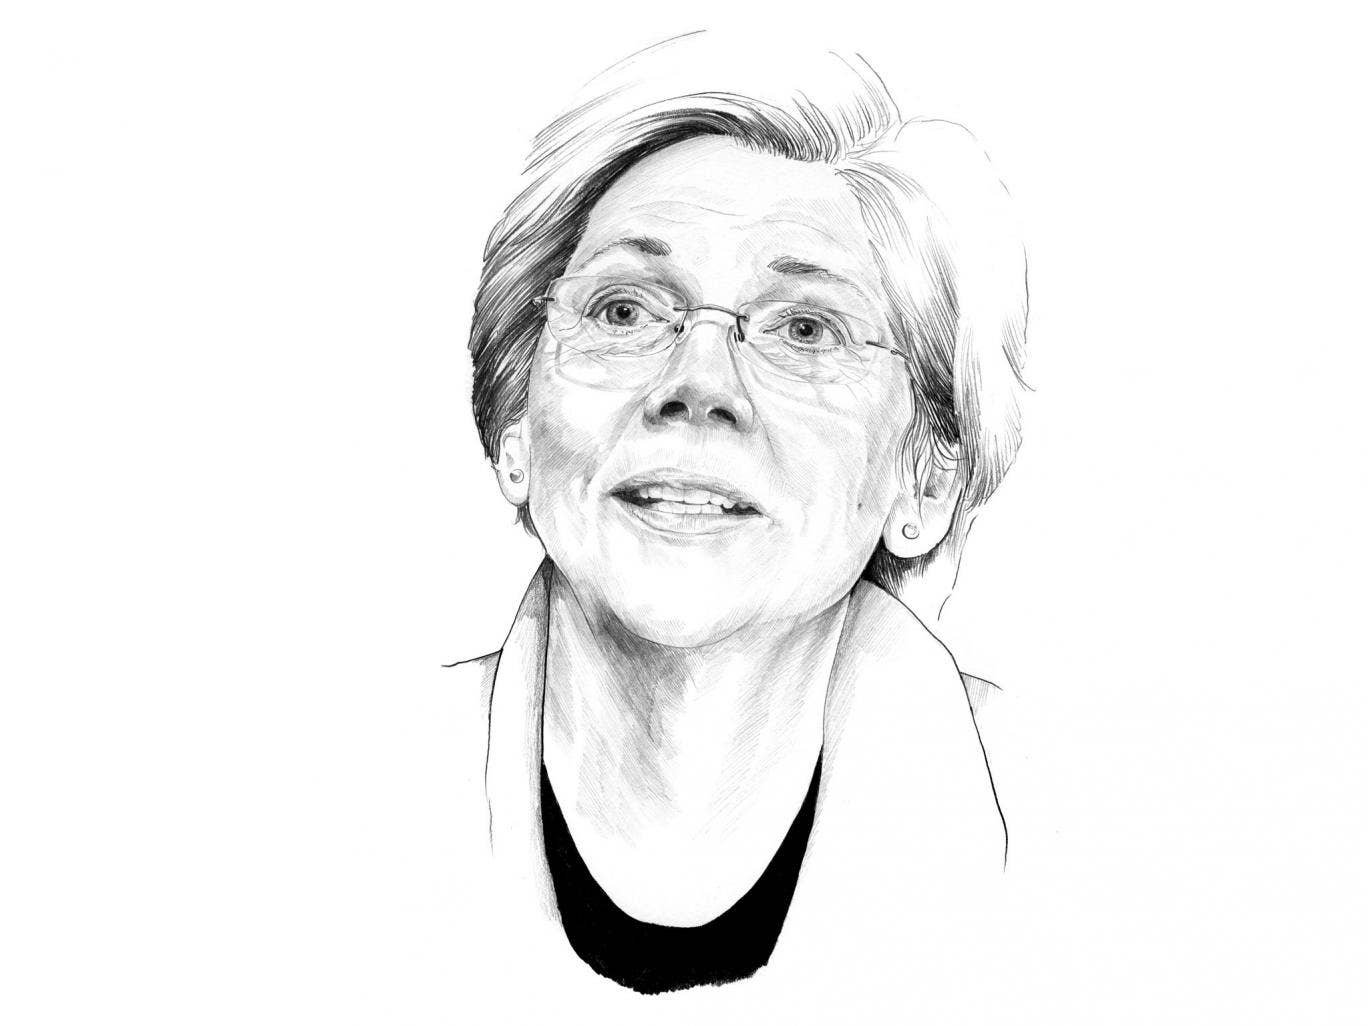 Elizabeth Warren, who launched her political career in 2012